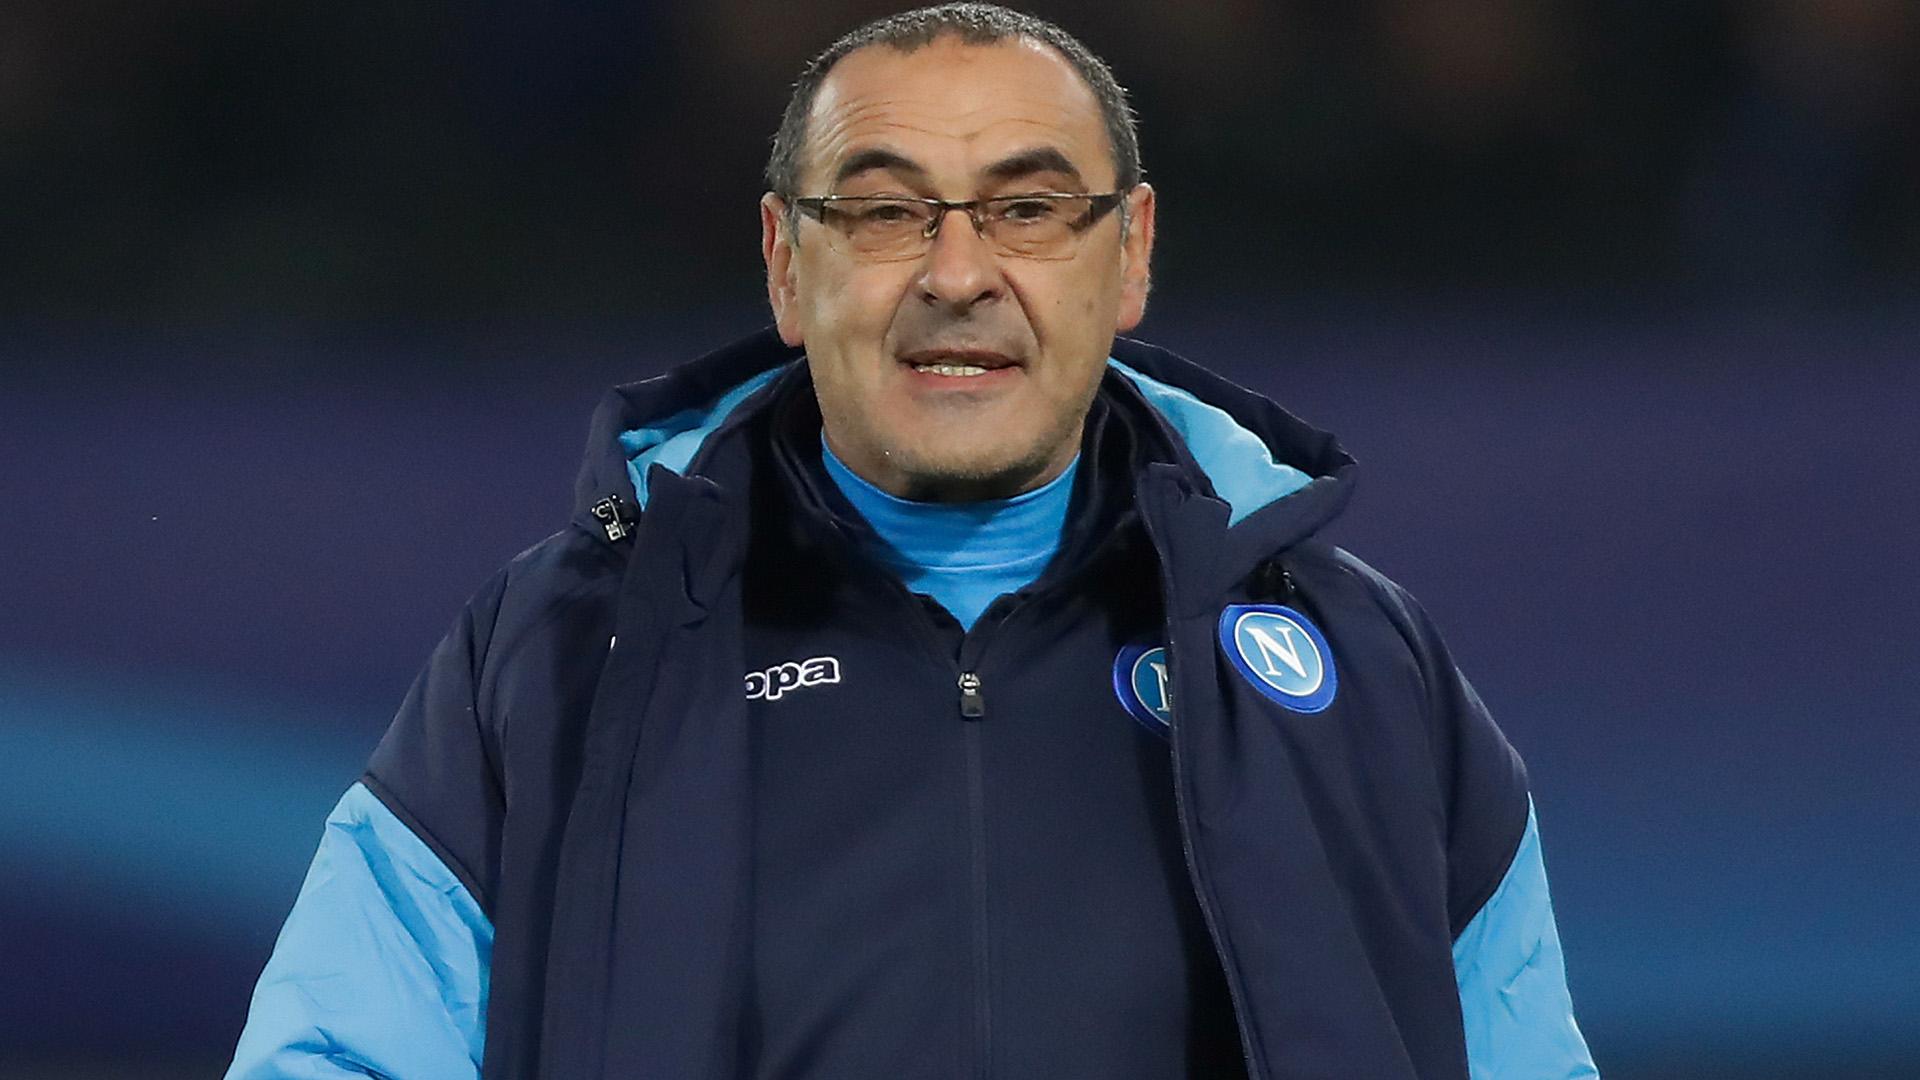 Napoli, da Hamsik sorpresa 'segreta' per Maradona